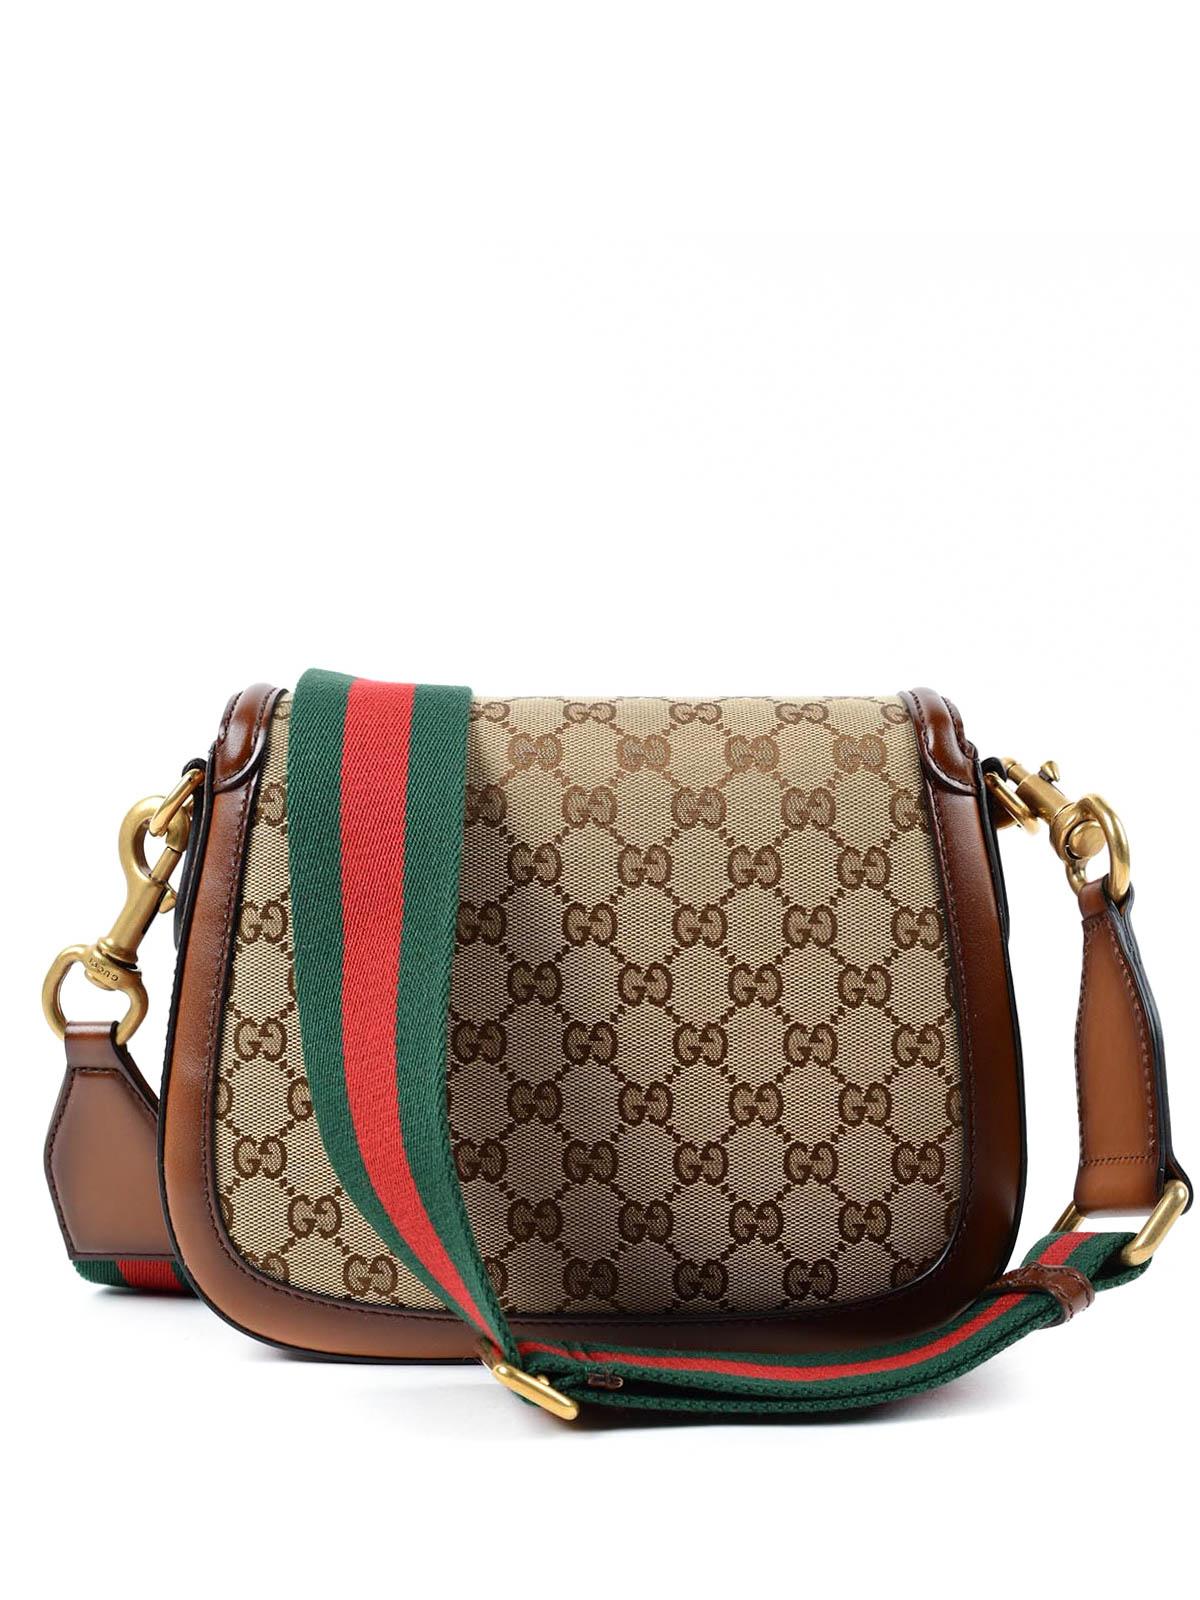 Gucci - Lady Web Original GG canvas bag - Bolsos de hombro - 383848 ... 7c449fea690